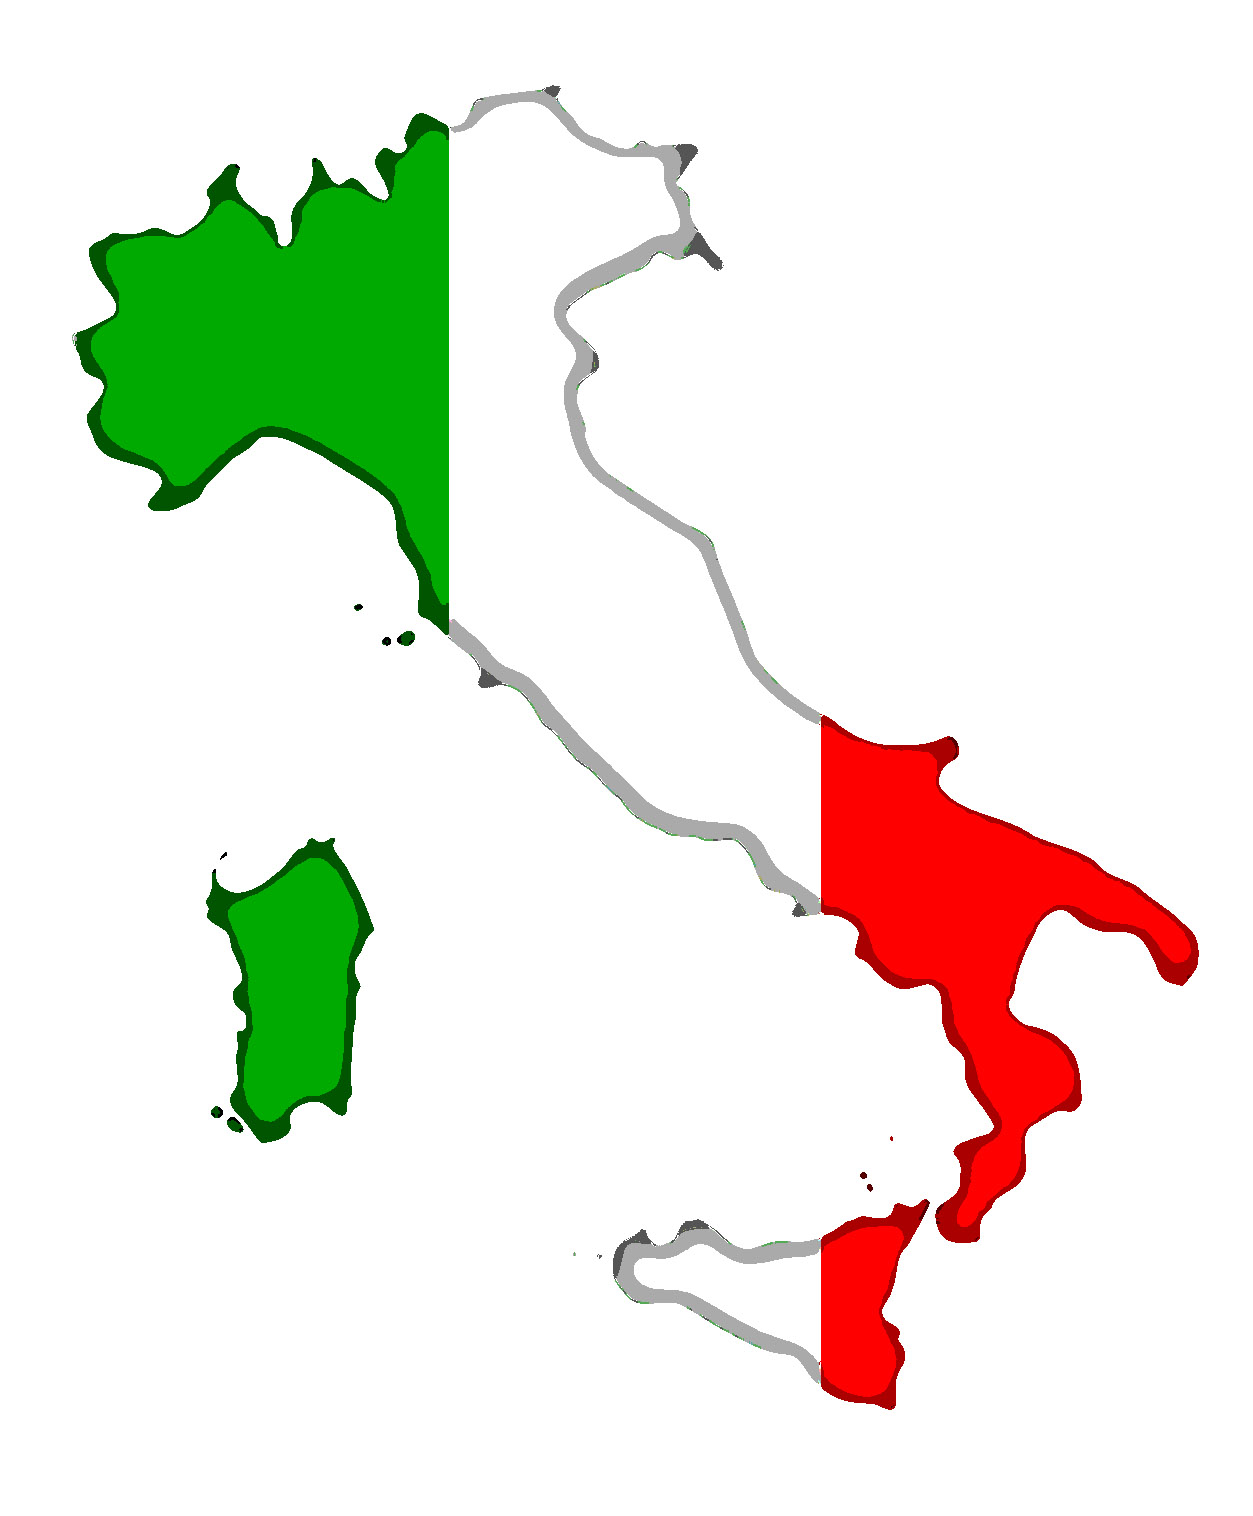 file/ELEMENTO_NEWSLETTER/20550/italiabandierax.jpg